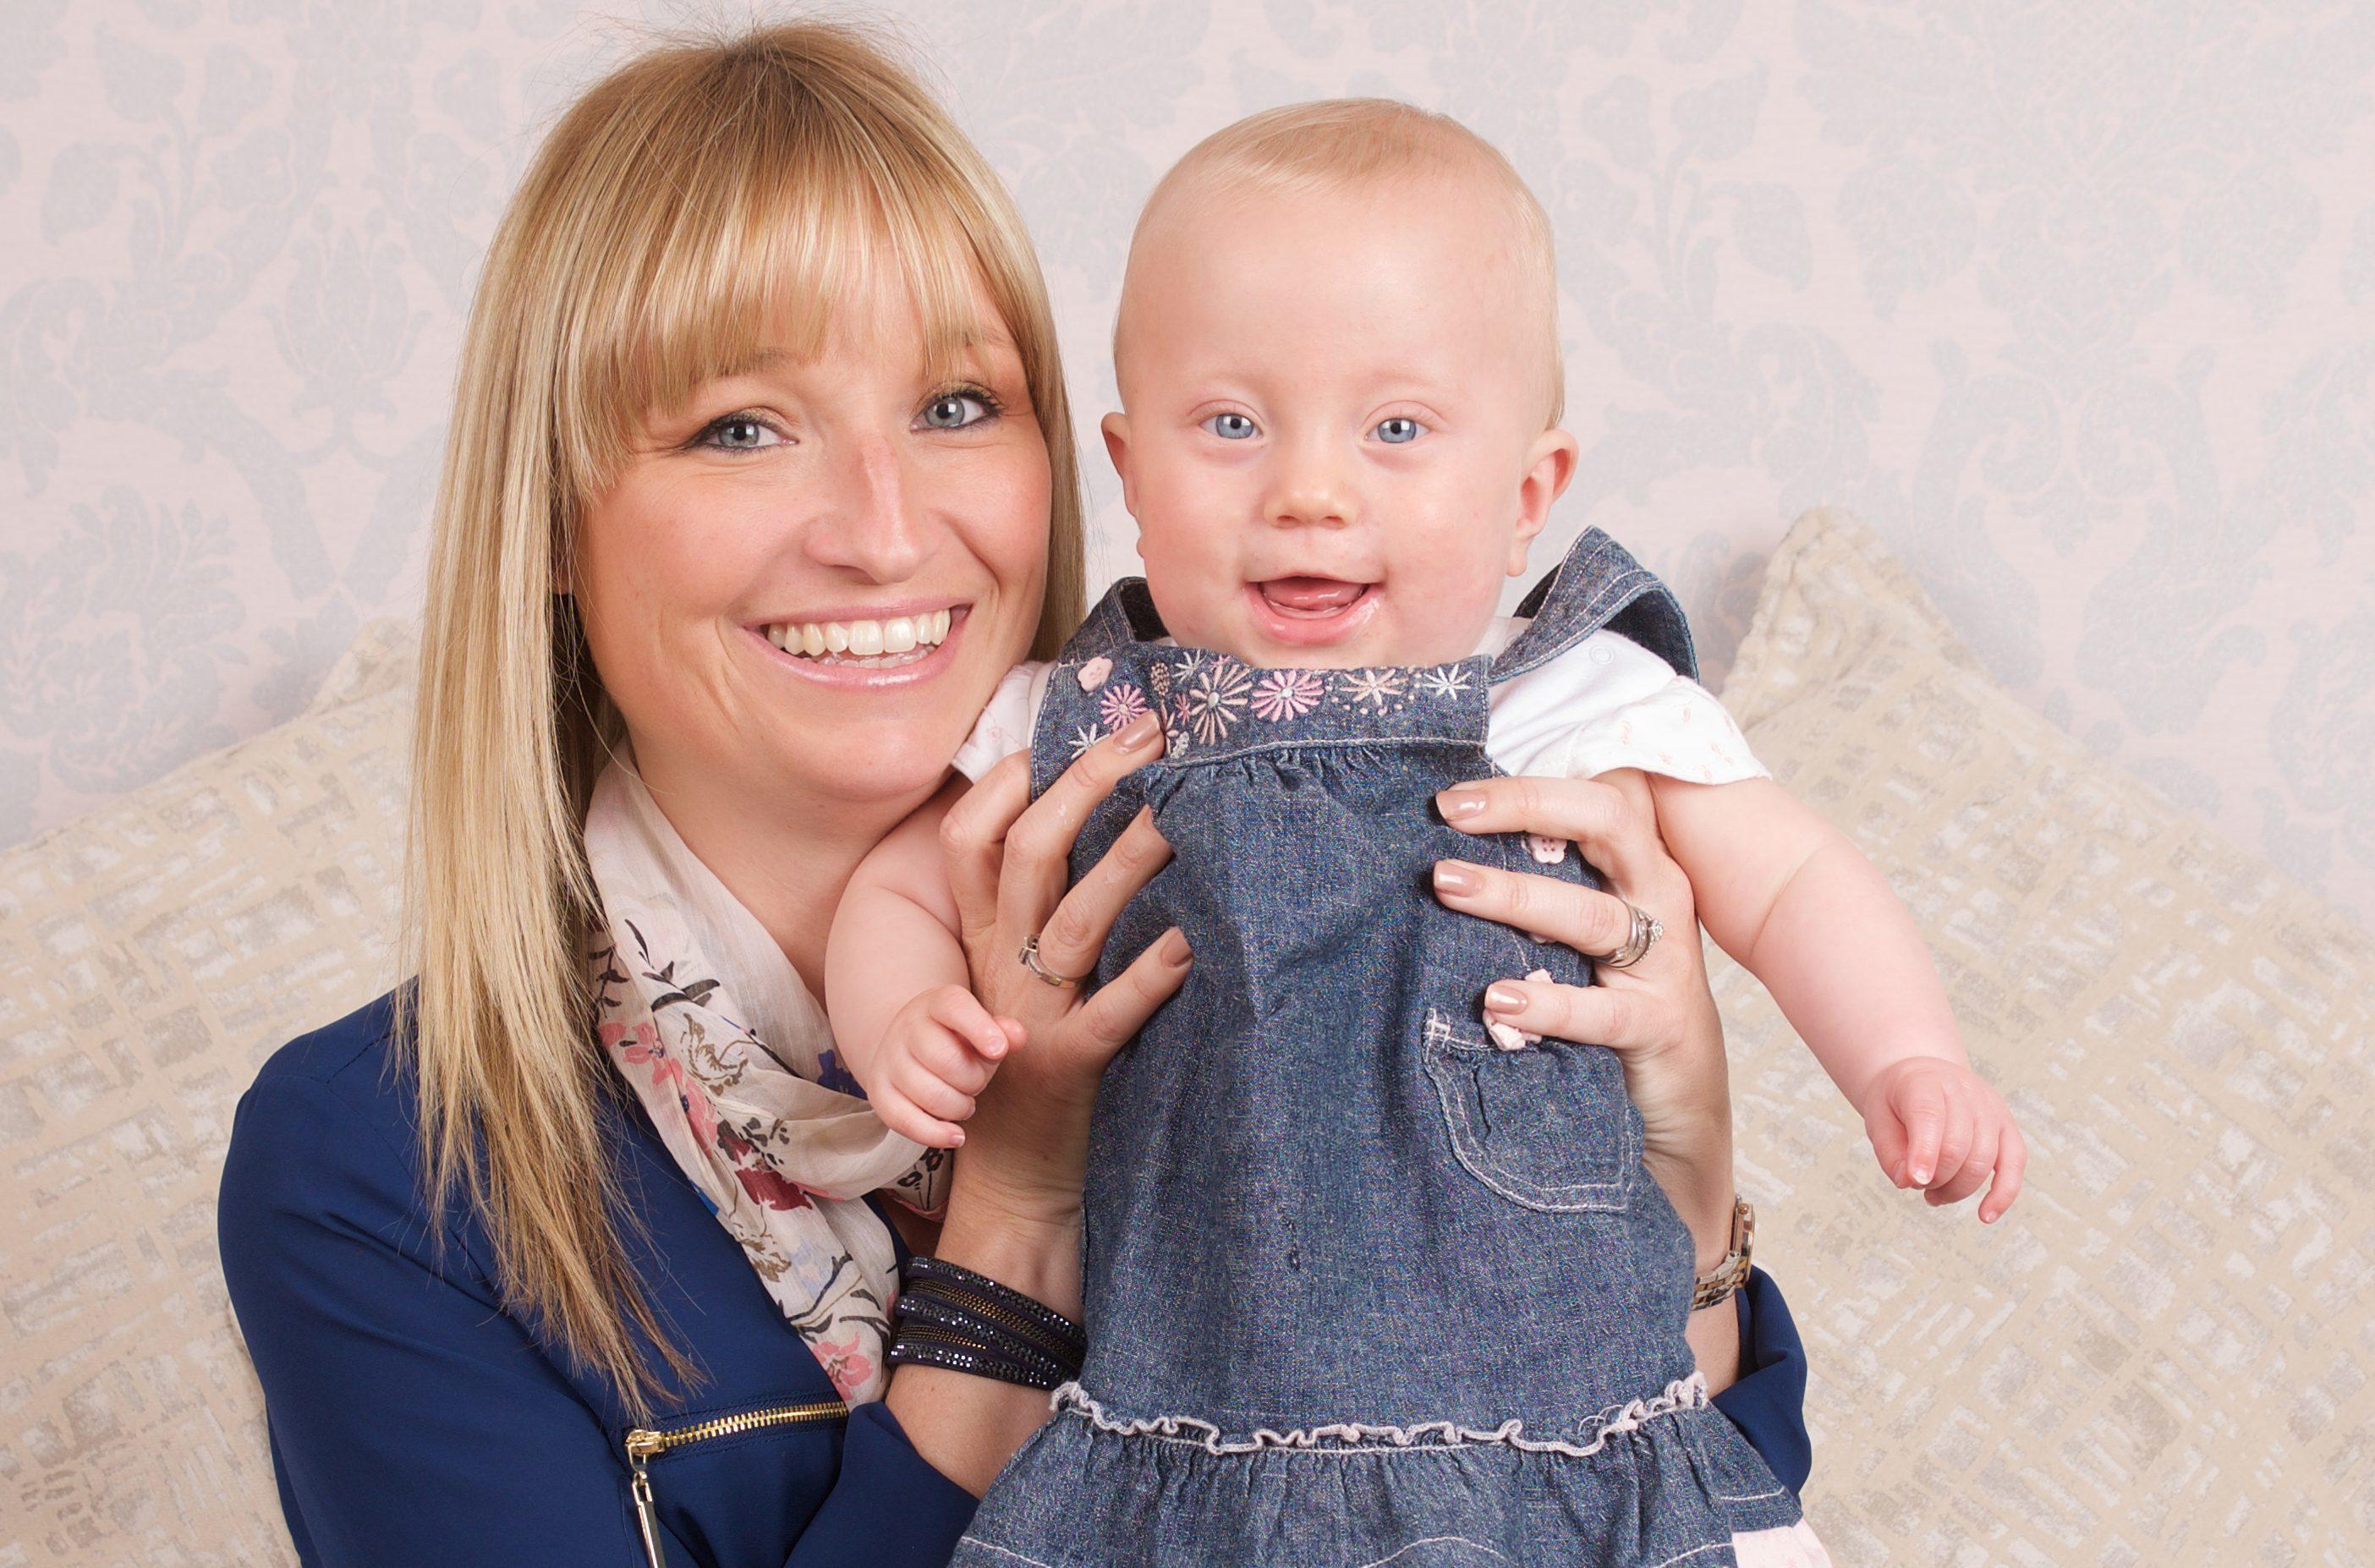 Sophia was born at just 26 weeks into Vicki's pregnancy (Ben Rector)